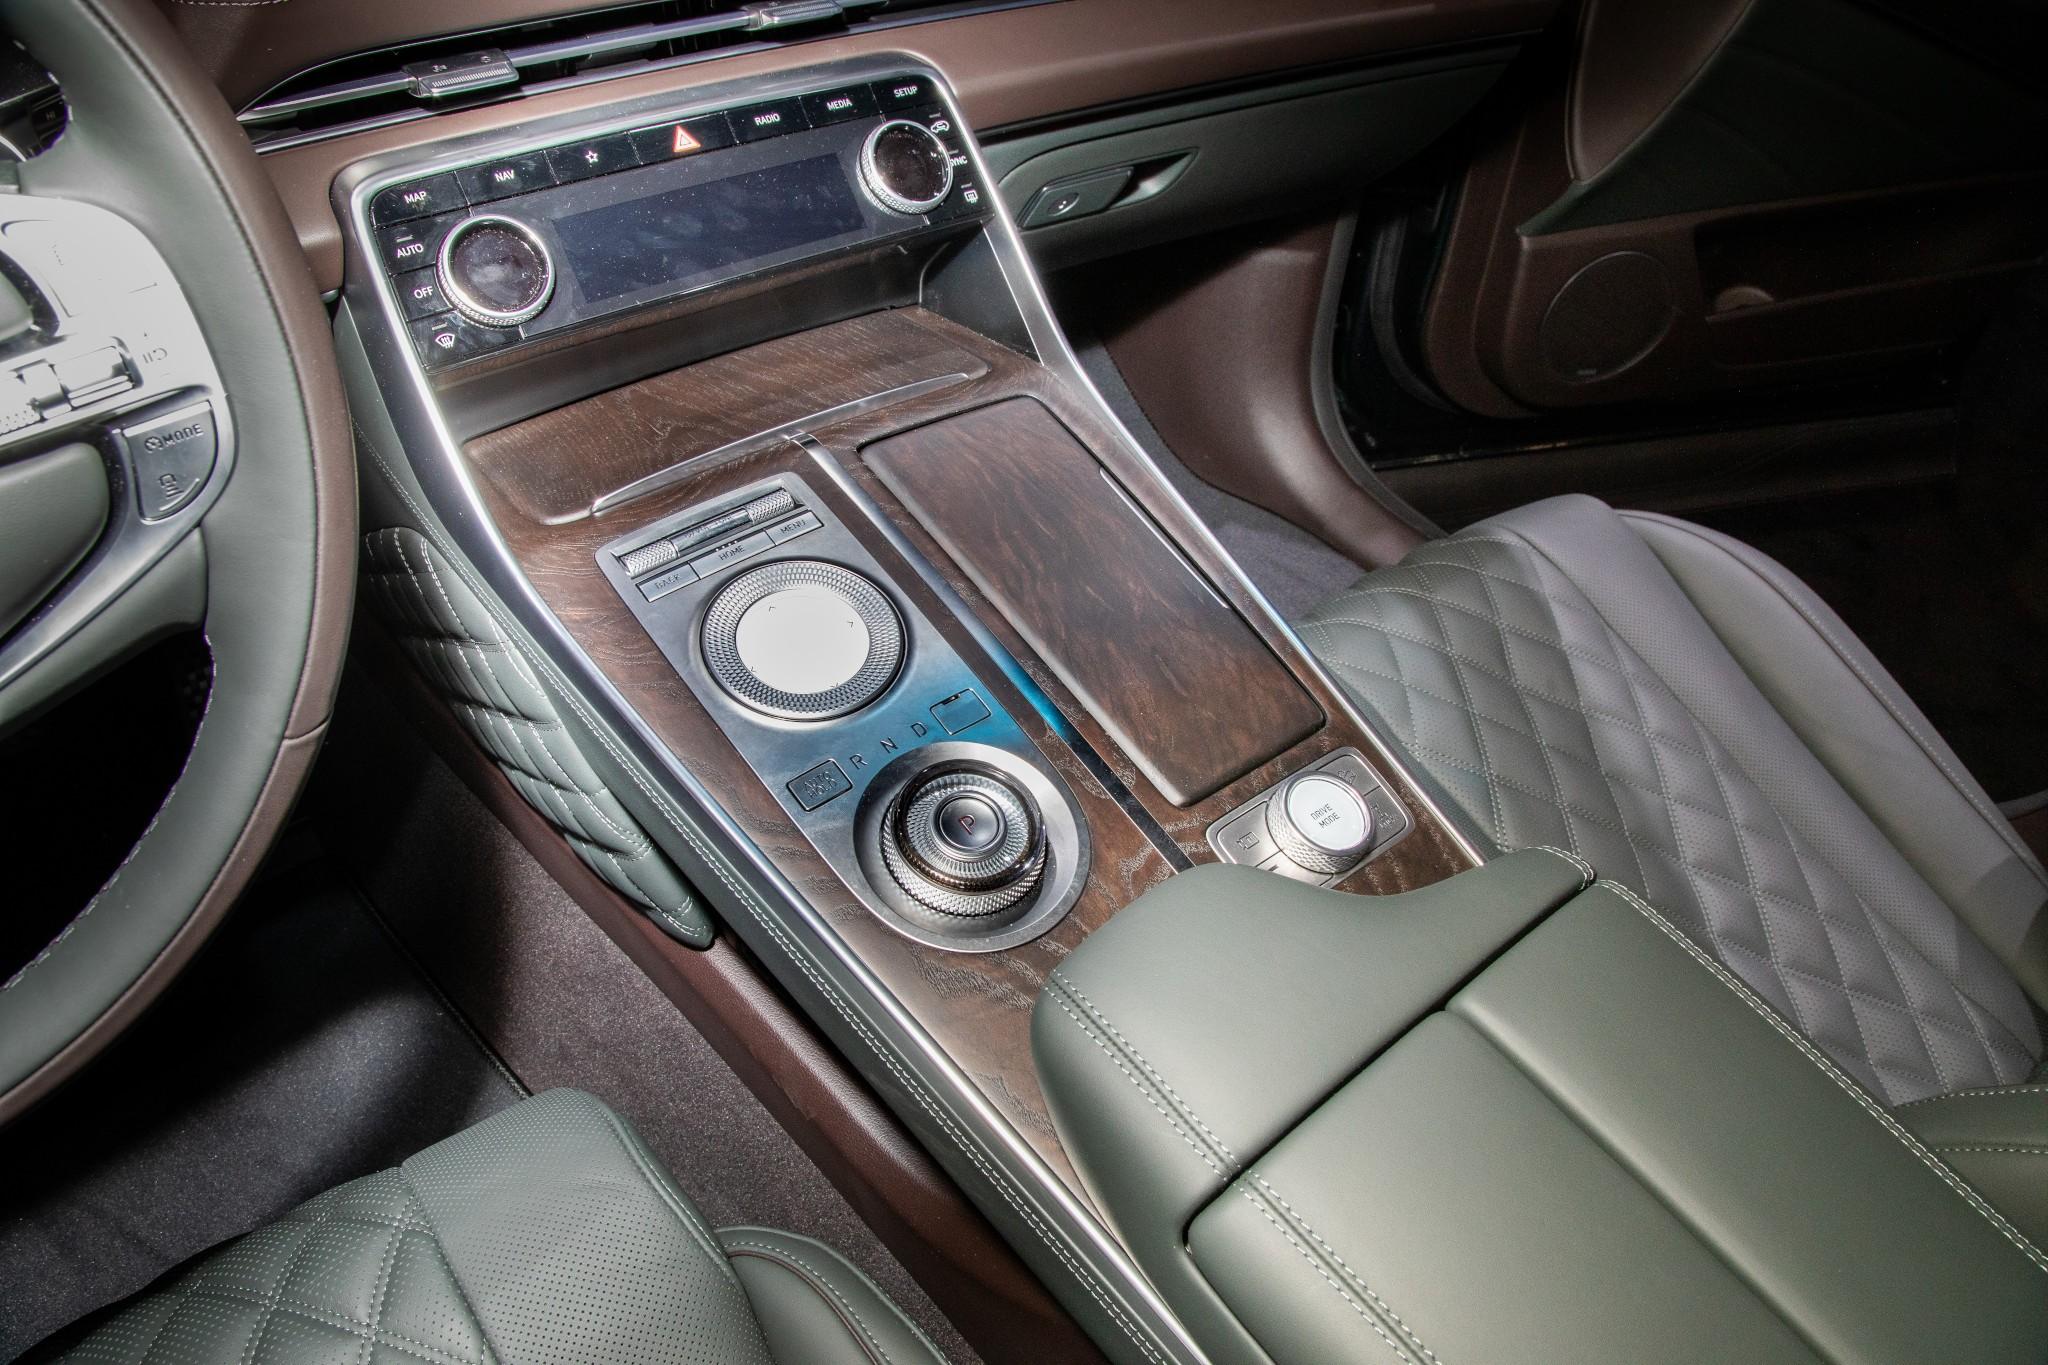 genesis-gv80-2021-14-center-console--front-row--interior.jpg